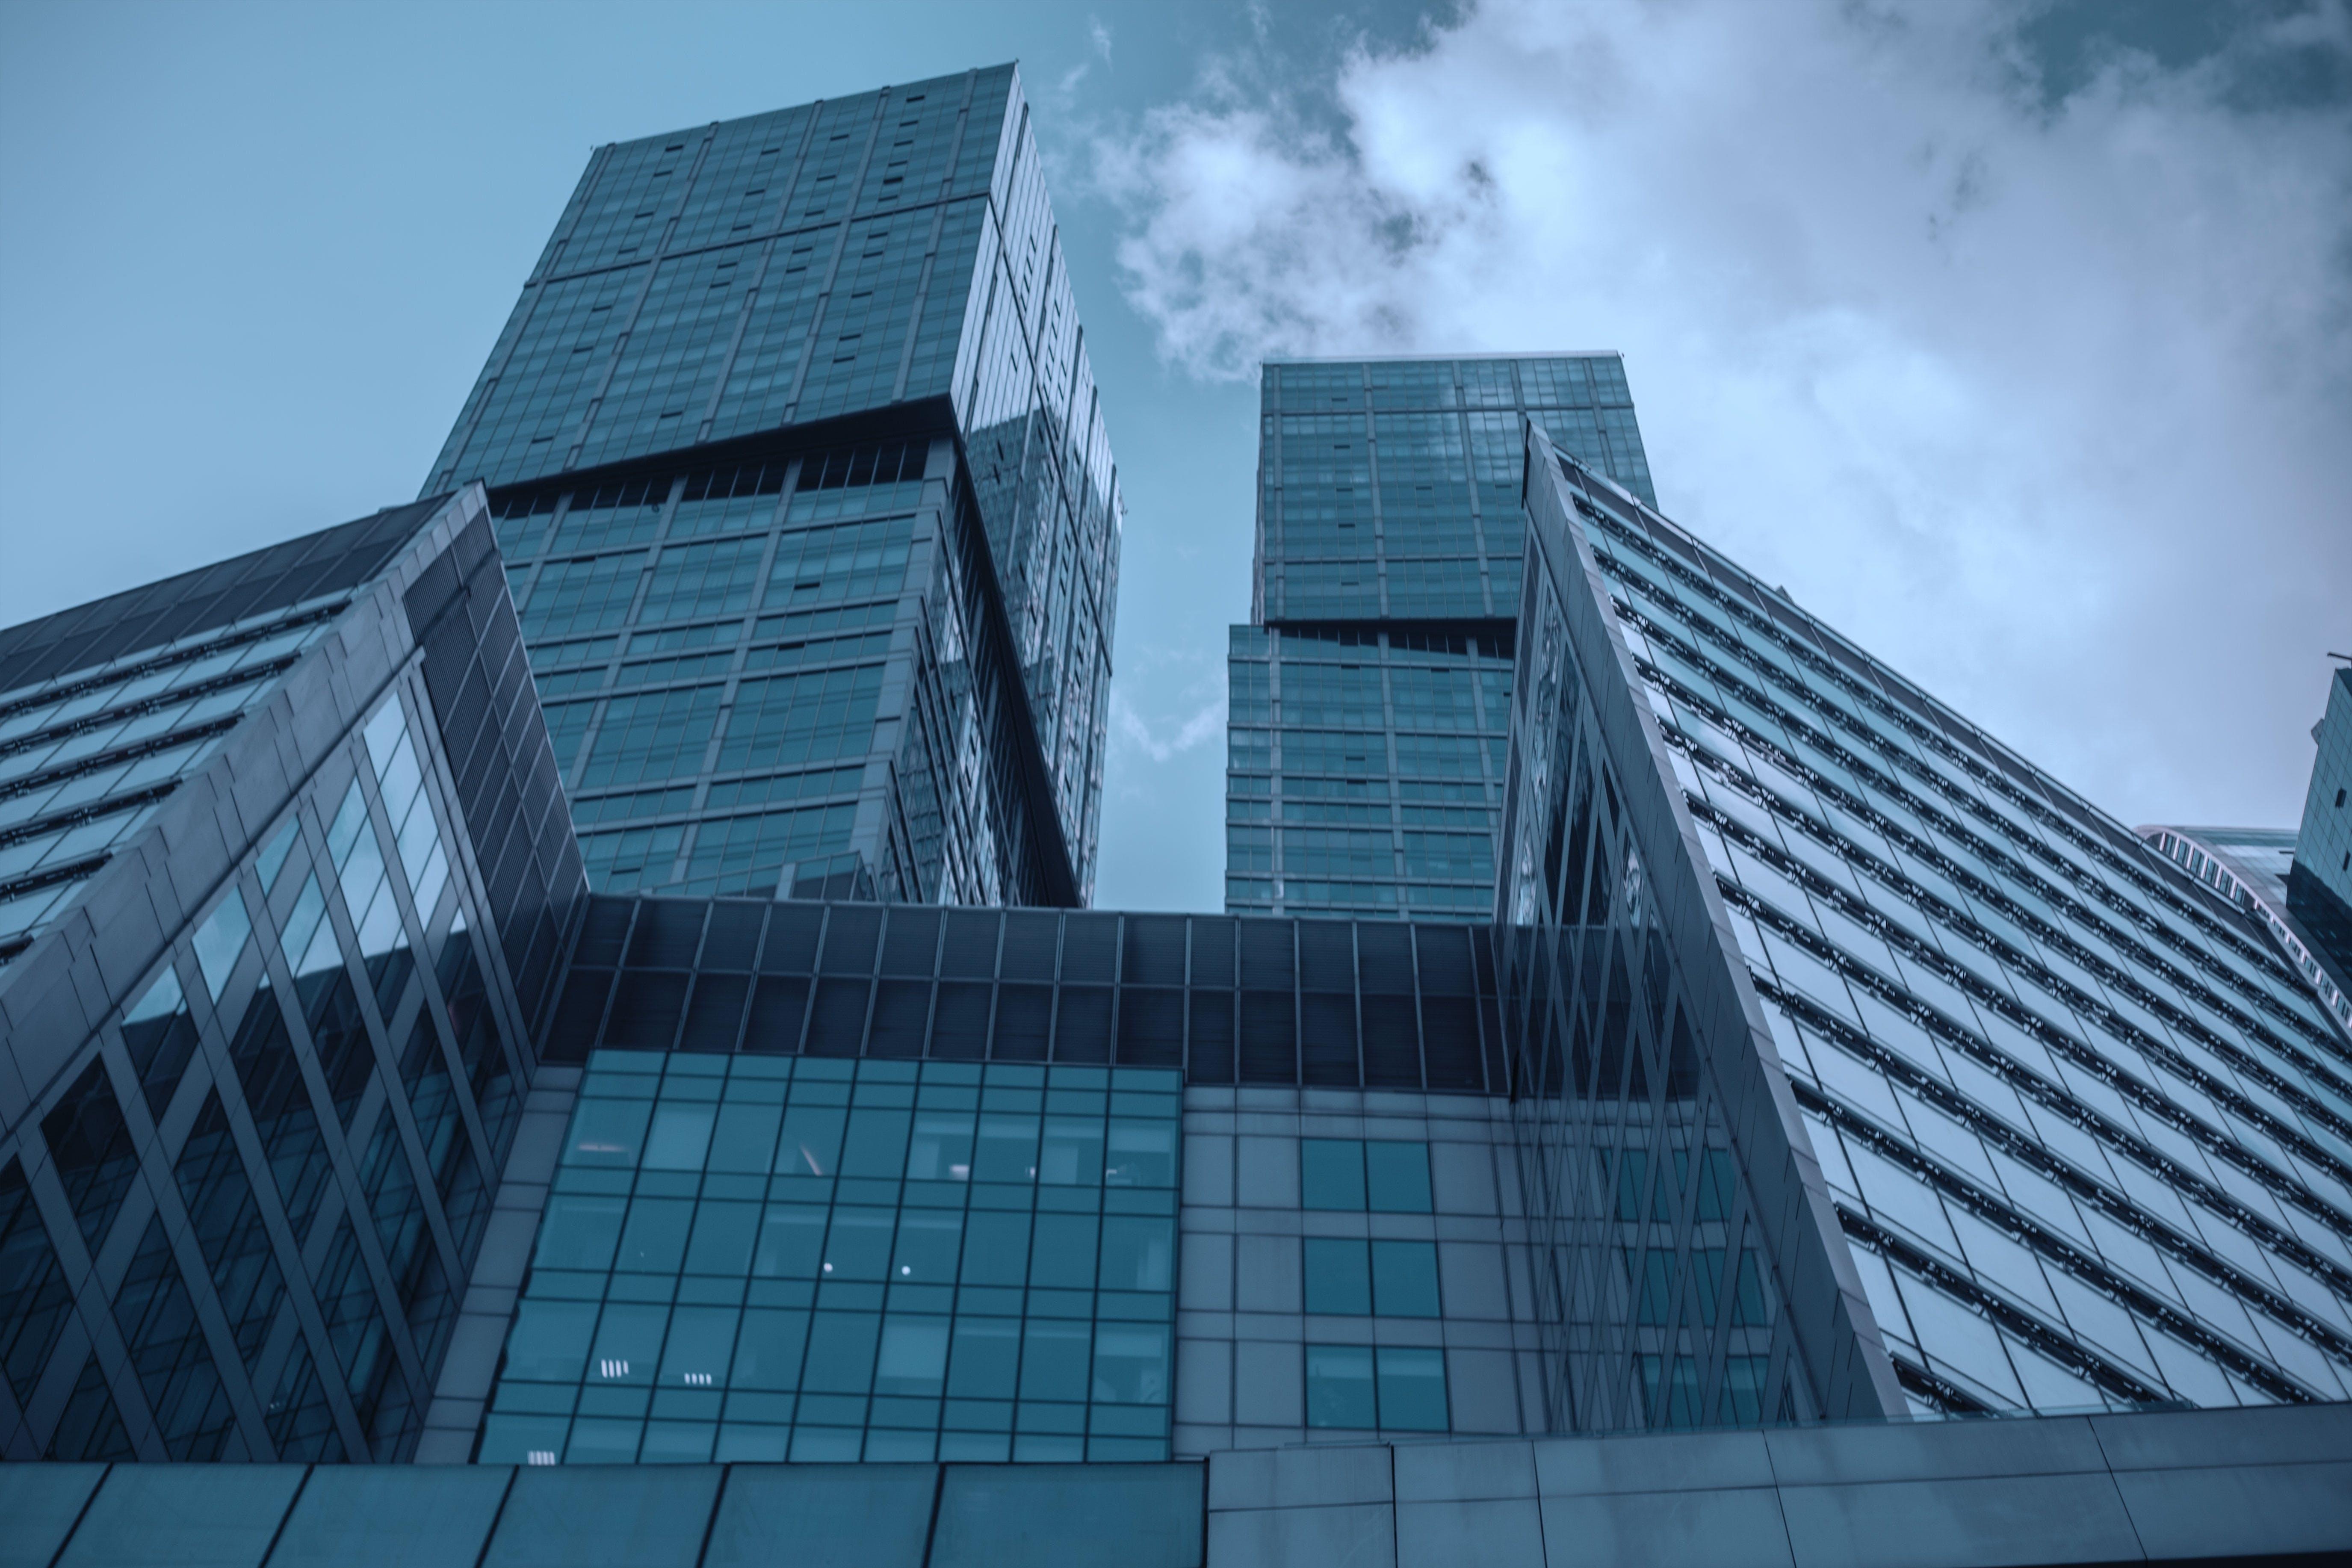 arkitektur, bygning, glas